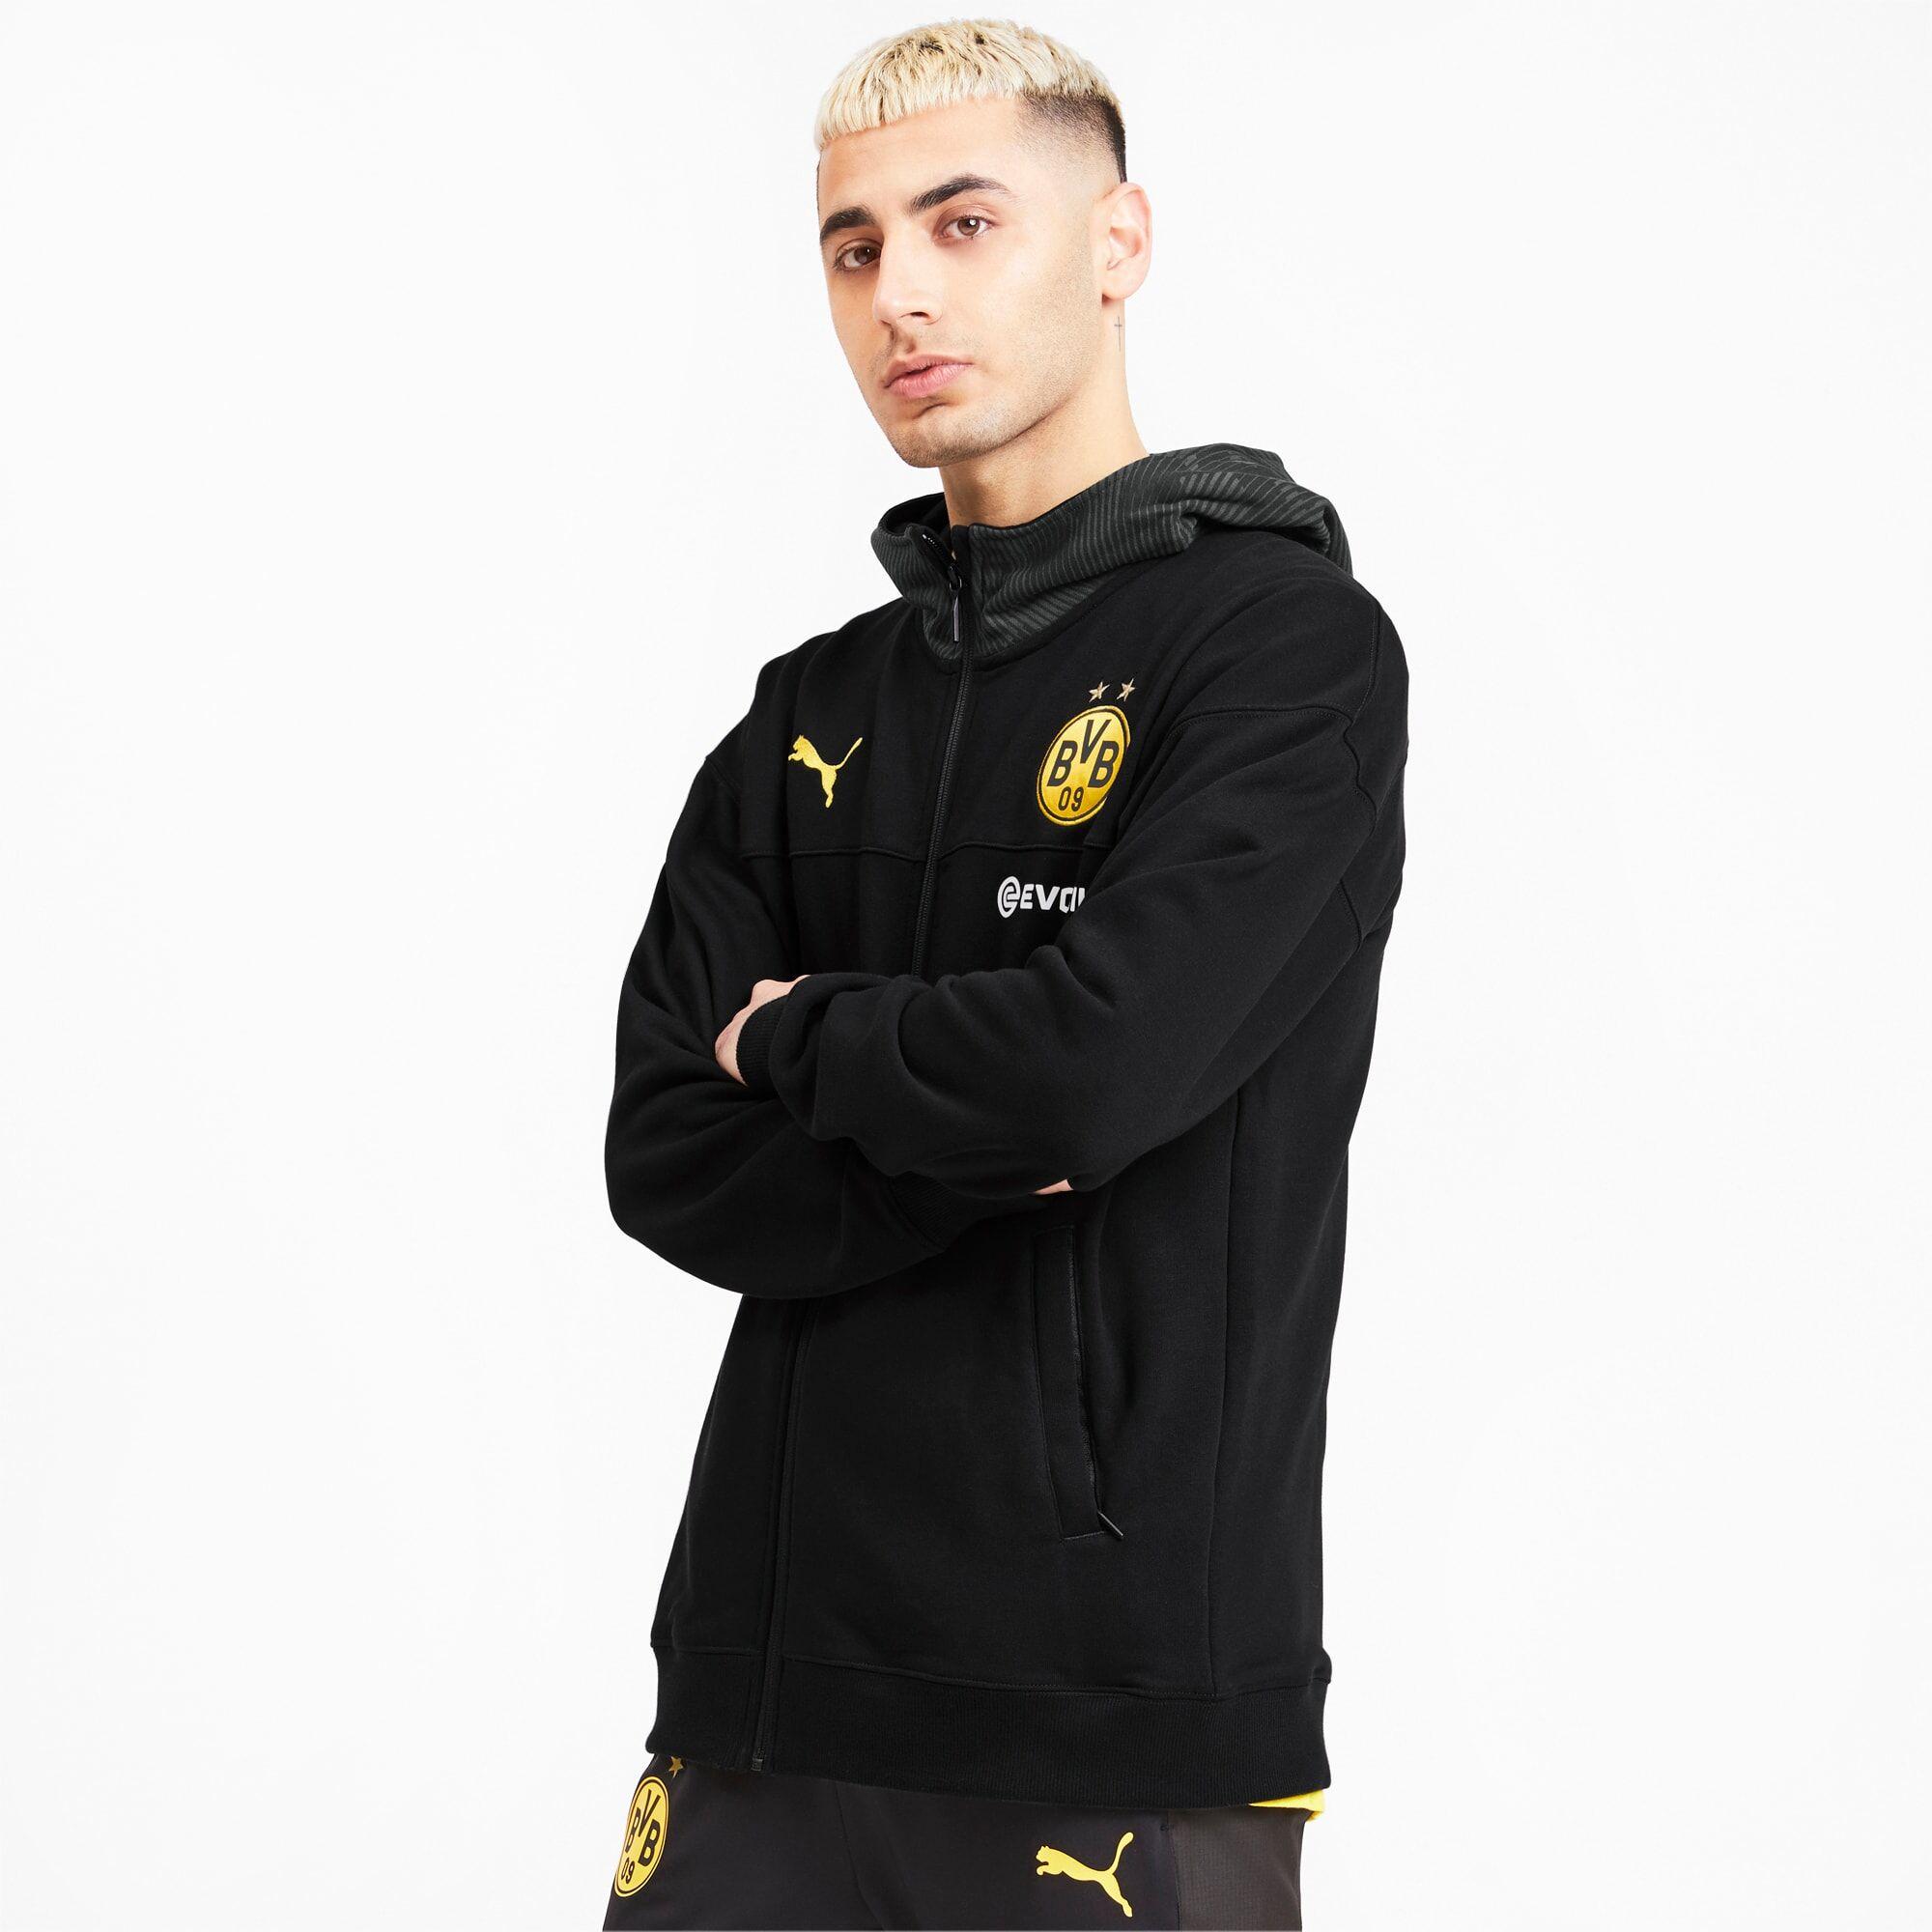 Puma BVB Casuals Men's Jacket,  Black/Phantom Black, size Small, Clothing